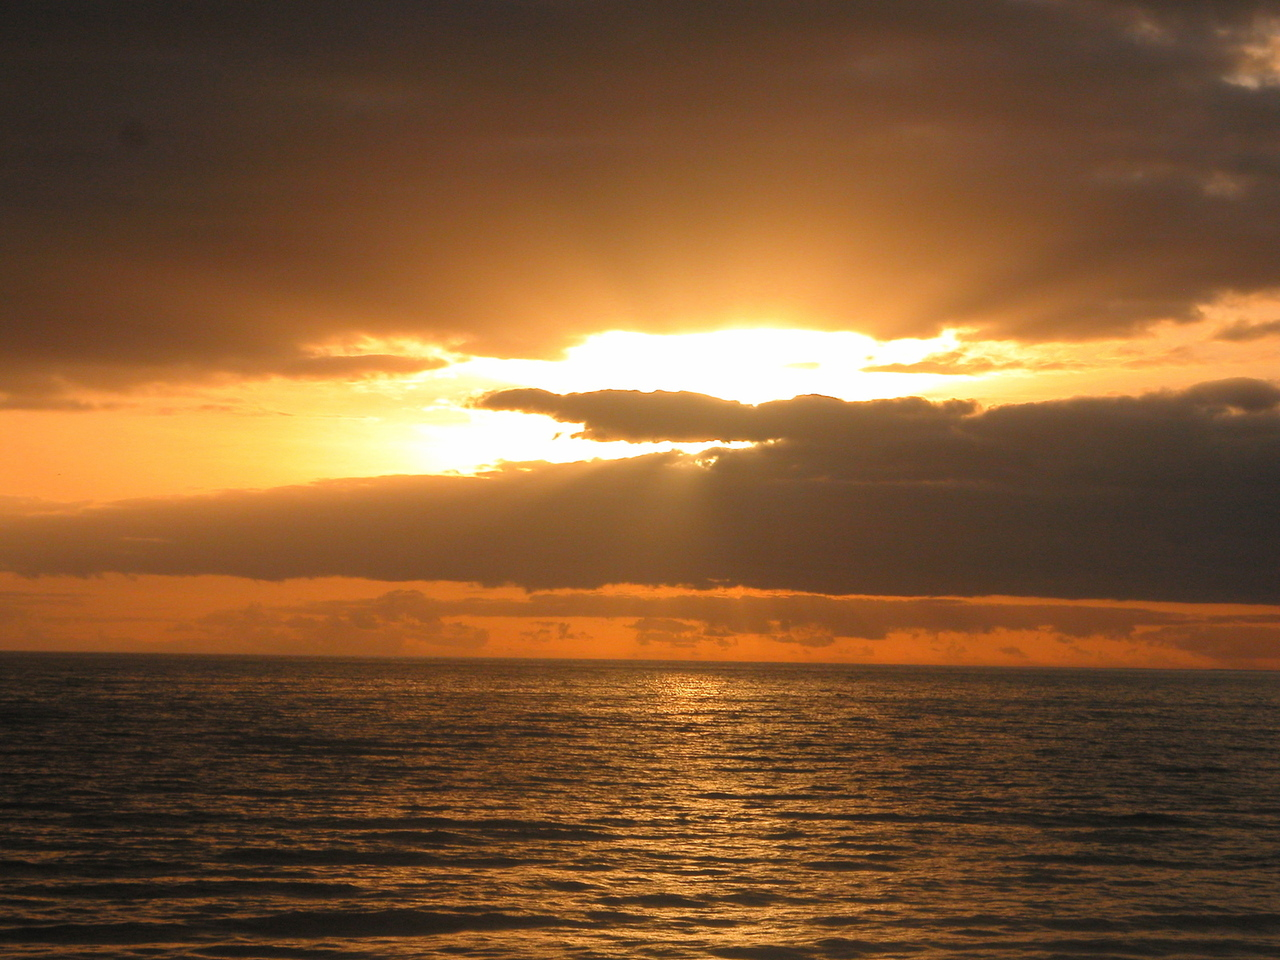 sunrise-1381216-1280x960.jpg